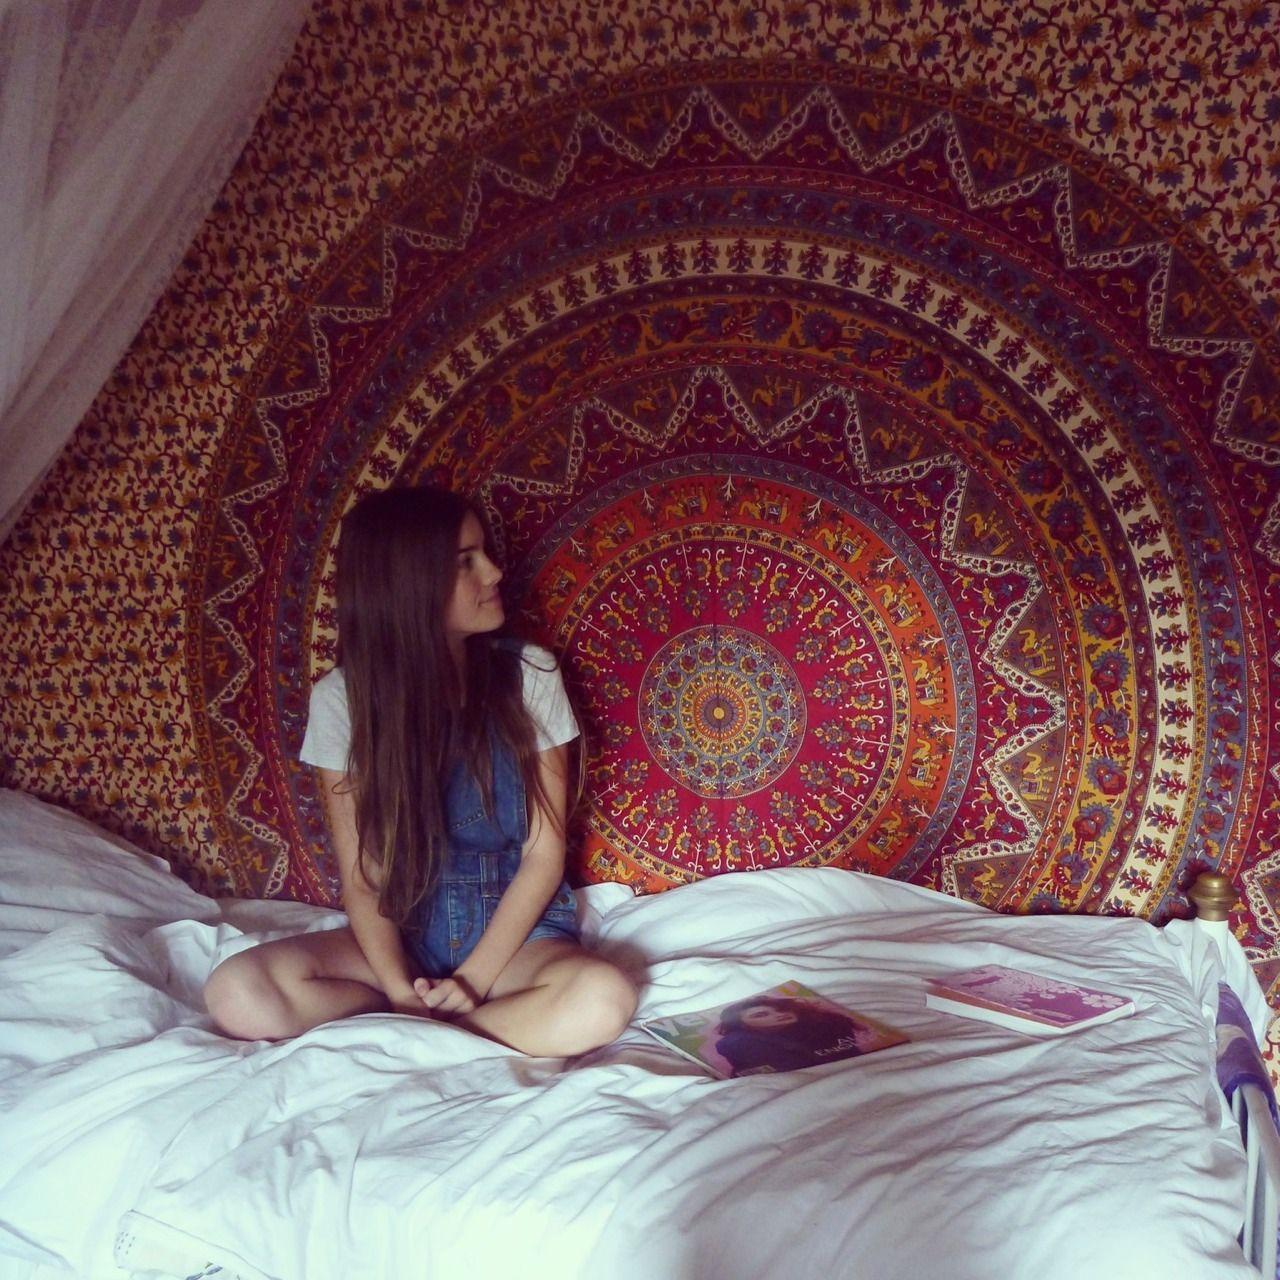 persian-girl-in-bed